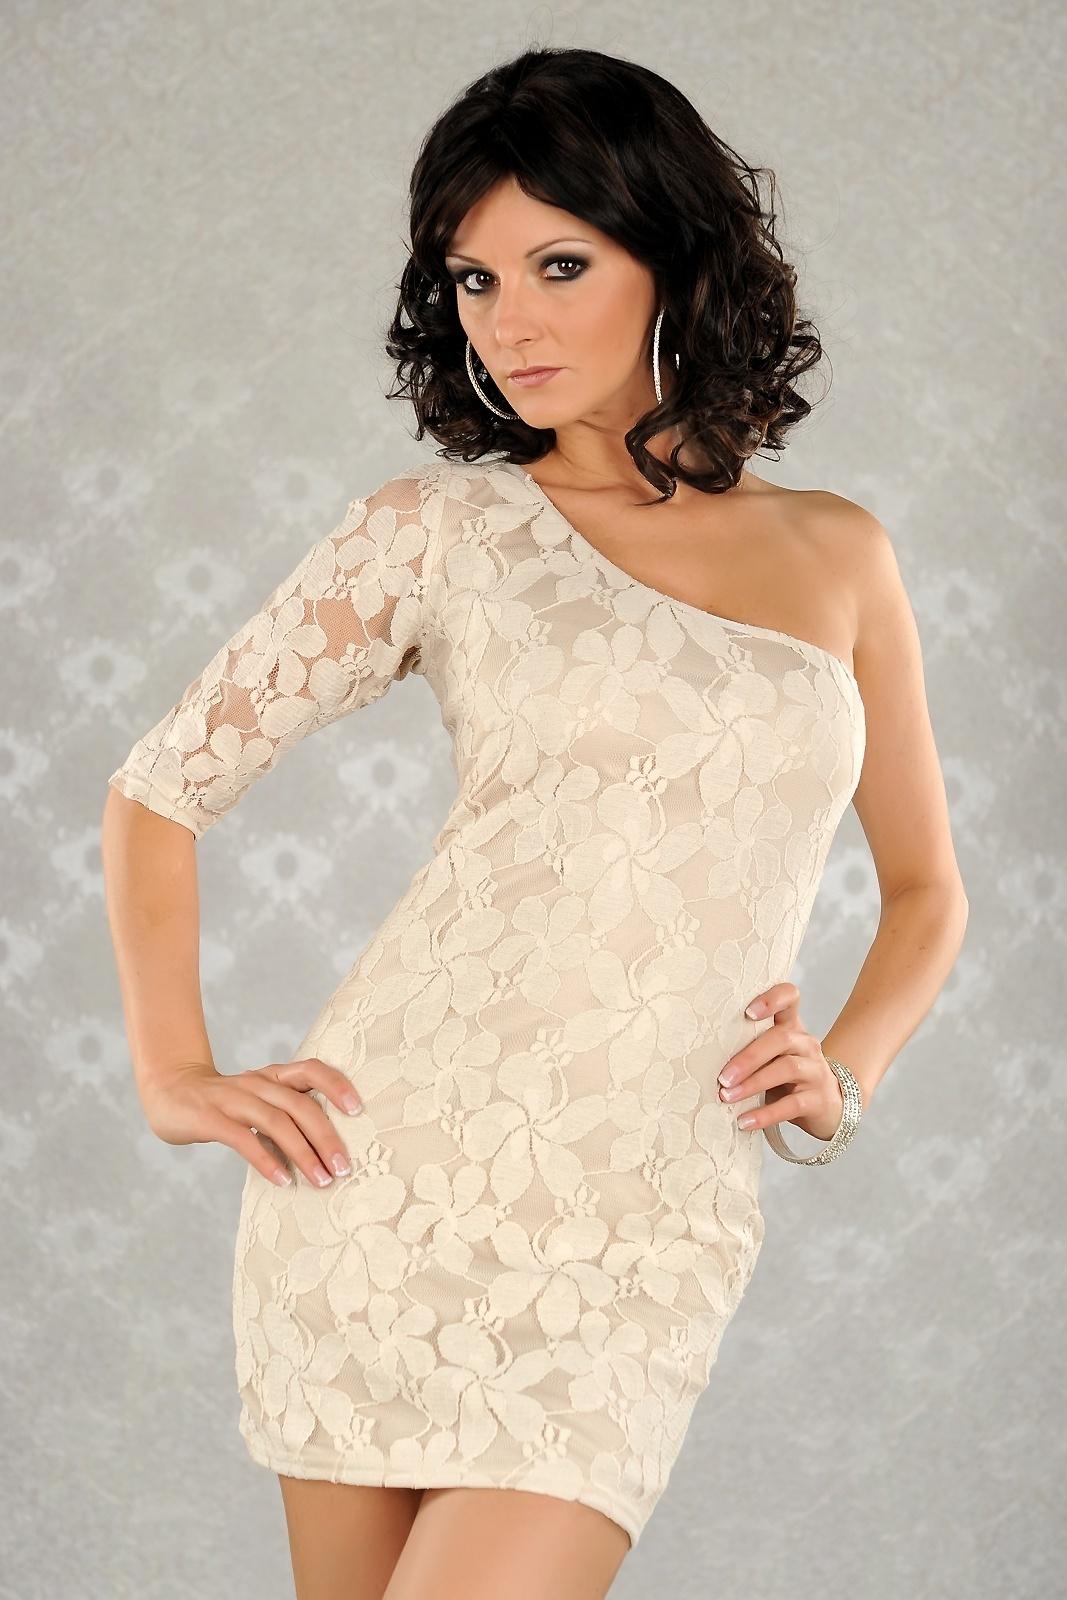 56bf35c426  MB29  Beżowa sukienka koronkowa na jedno ramię